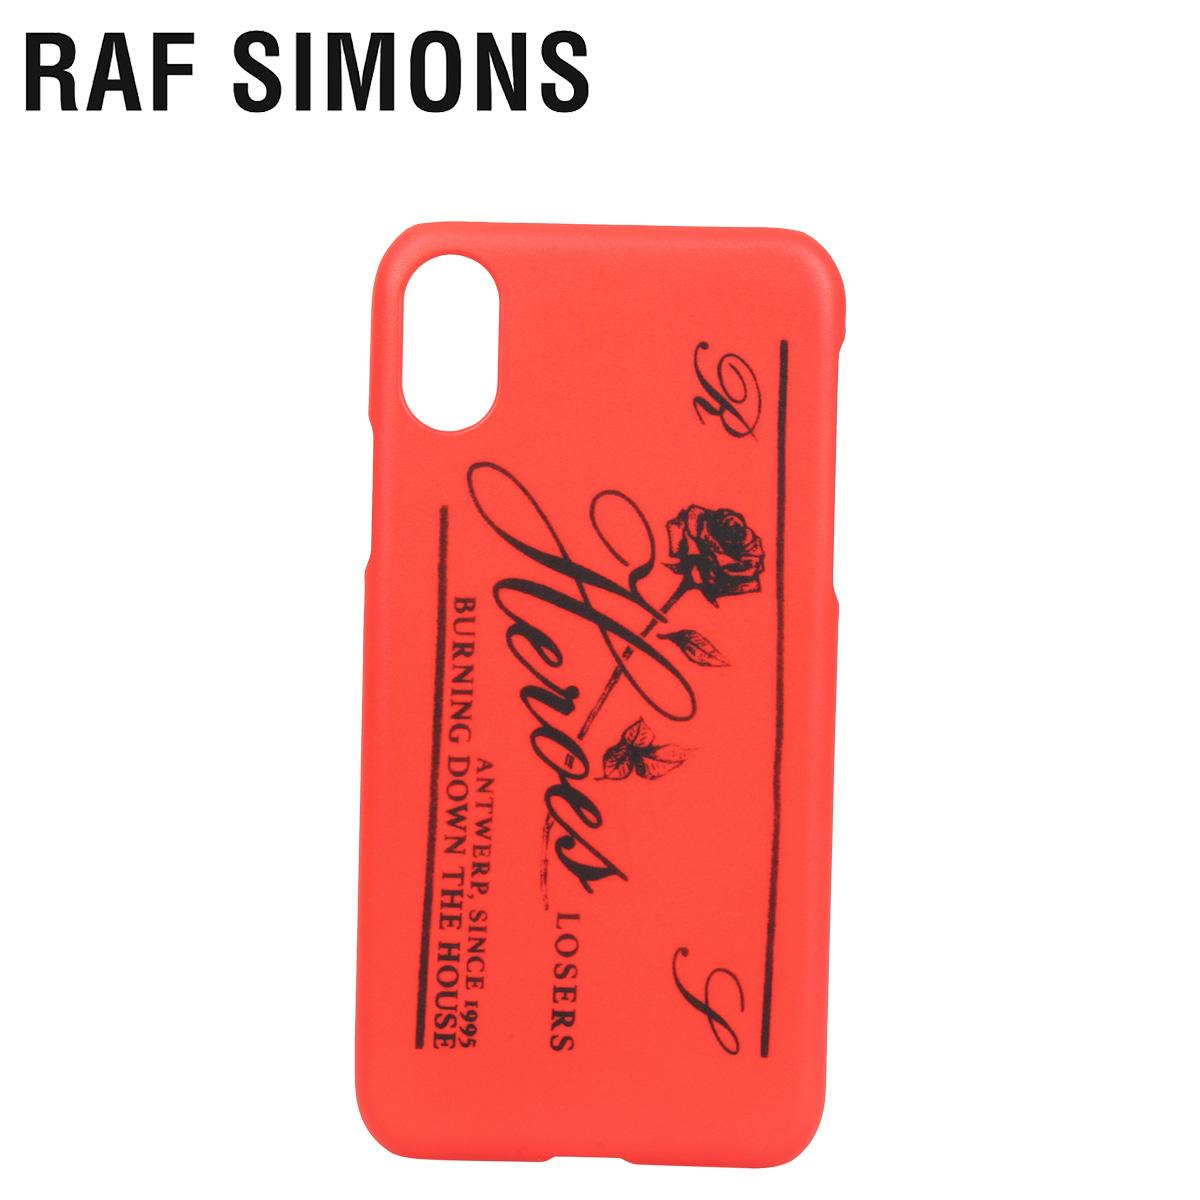 RAF SIMONS ラフシモンズ iPhone XS X ケース スマホ 携帯 アイフォン メンズ レディース IPHONE CASE レッド 192-942